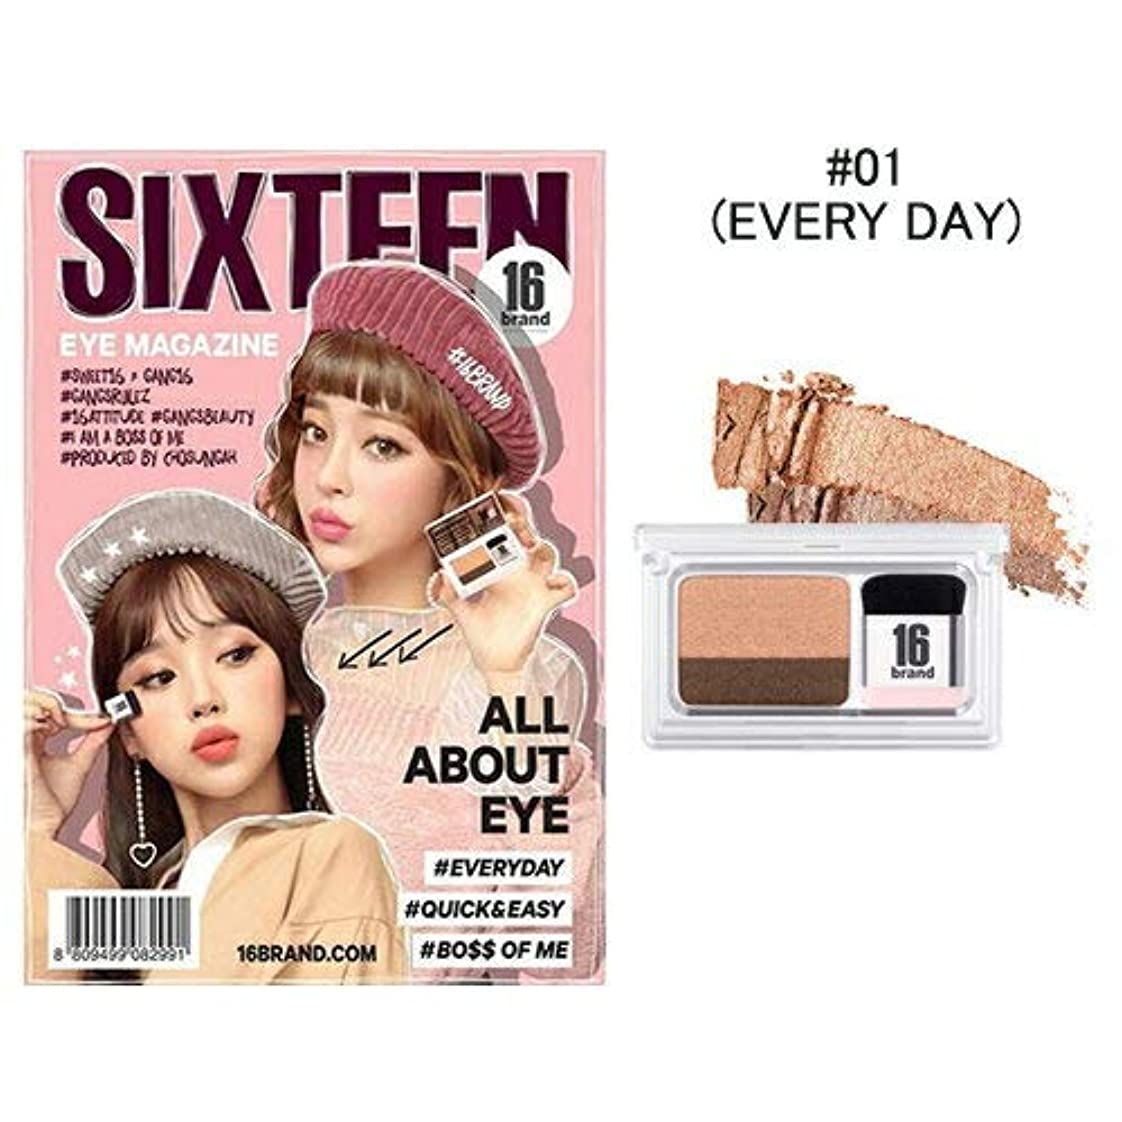 [New Color] 16brand Sixteen Eye Magazine 2g /16ブランド シックスティーン アイ マガジン 2g (#01 EVERY DAY) [並行輸入品]